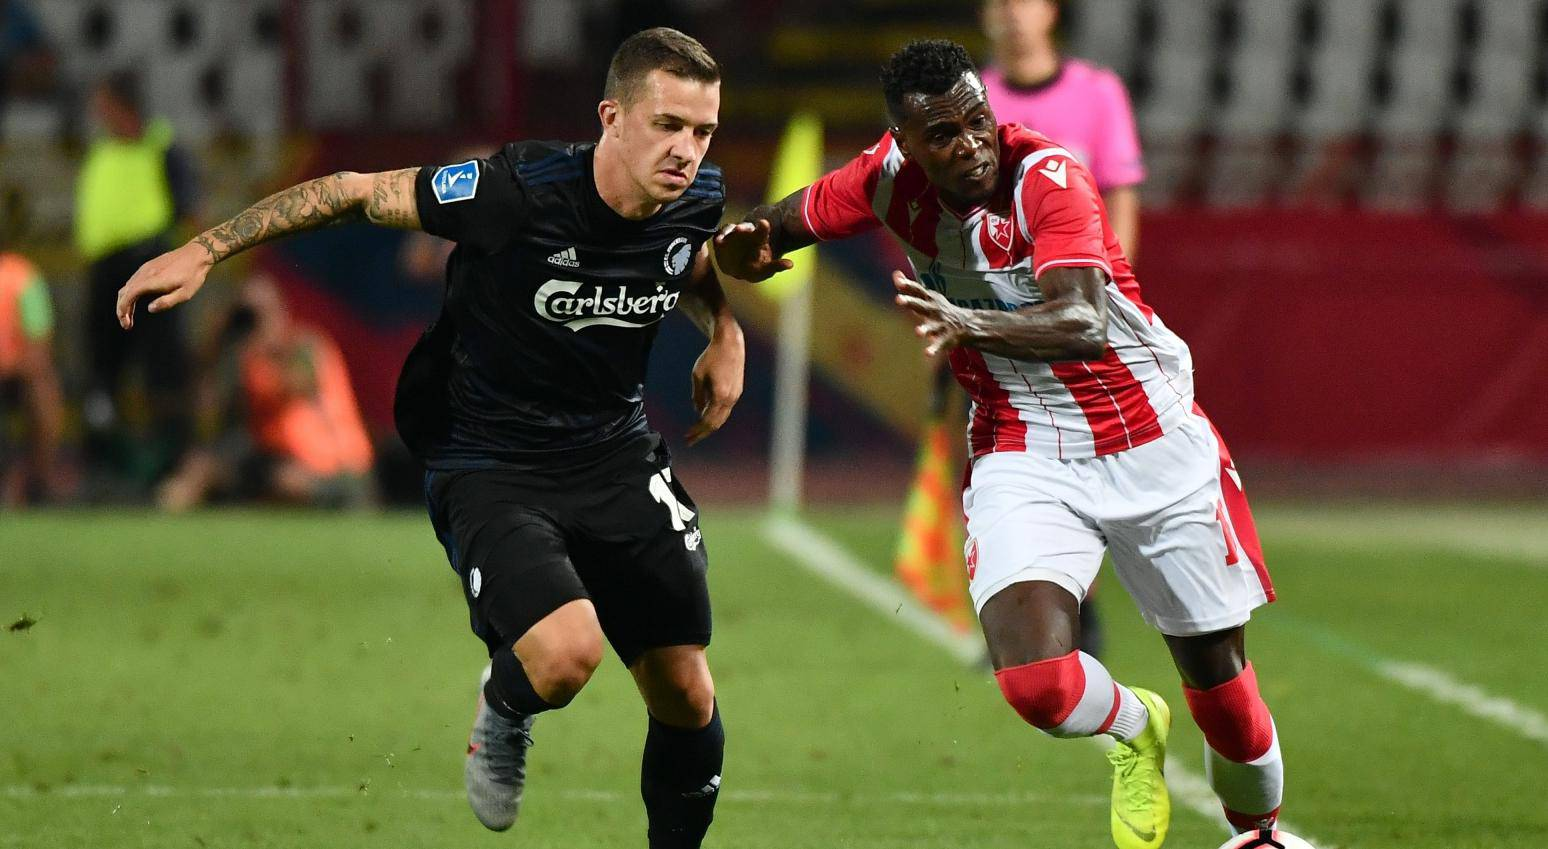 Beograd: Crvena Zvezda i Kopenhagen u 3. pretkolu UEFA Lige prvaka